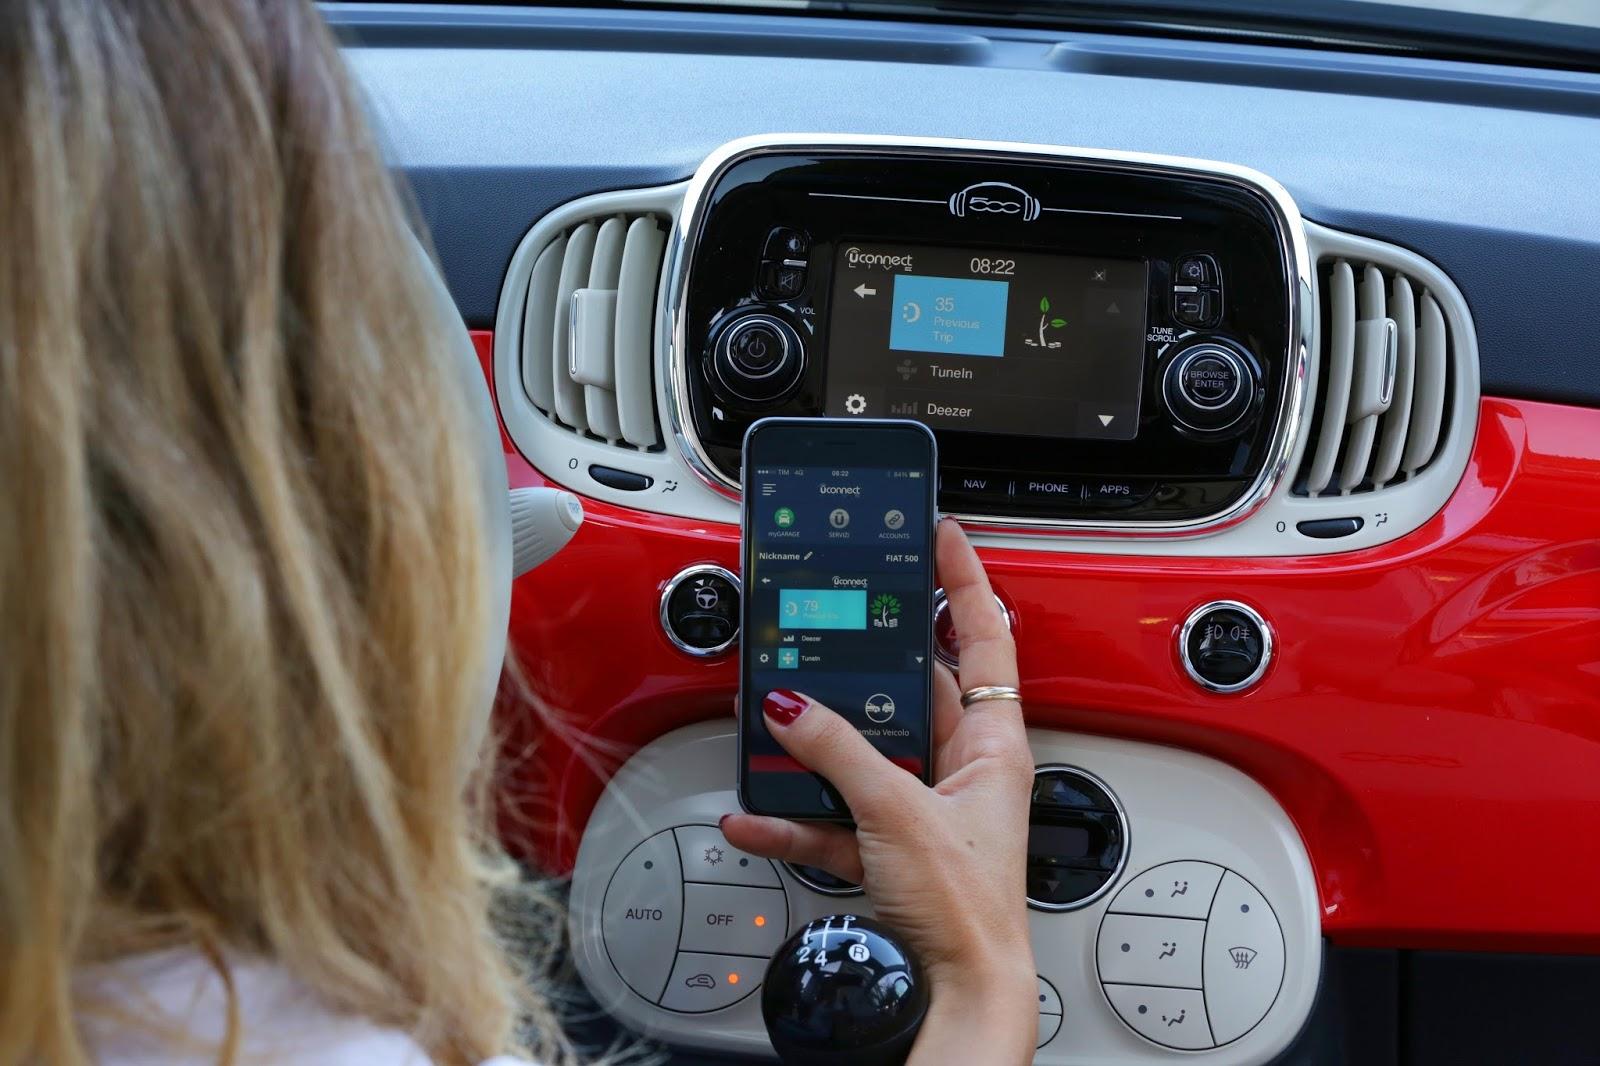 150714 Fiat Nuova 500 01 Η άφιξη του νέου Fiat 500 είναι γεγονός